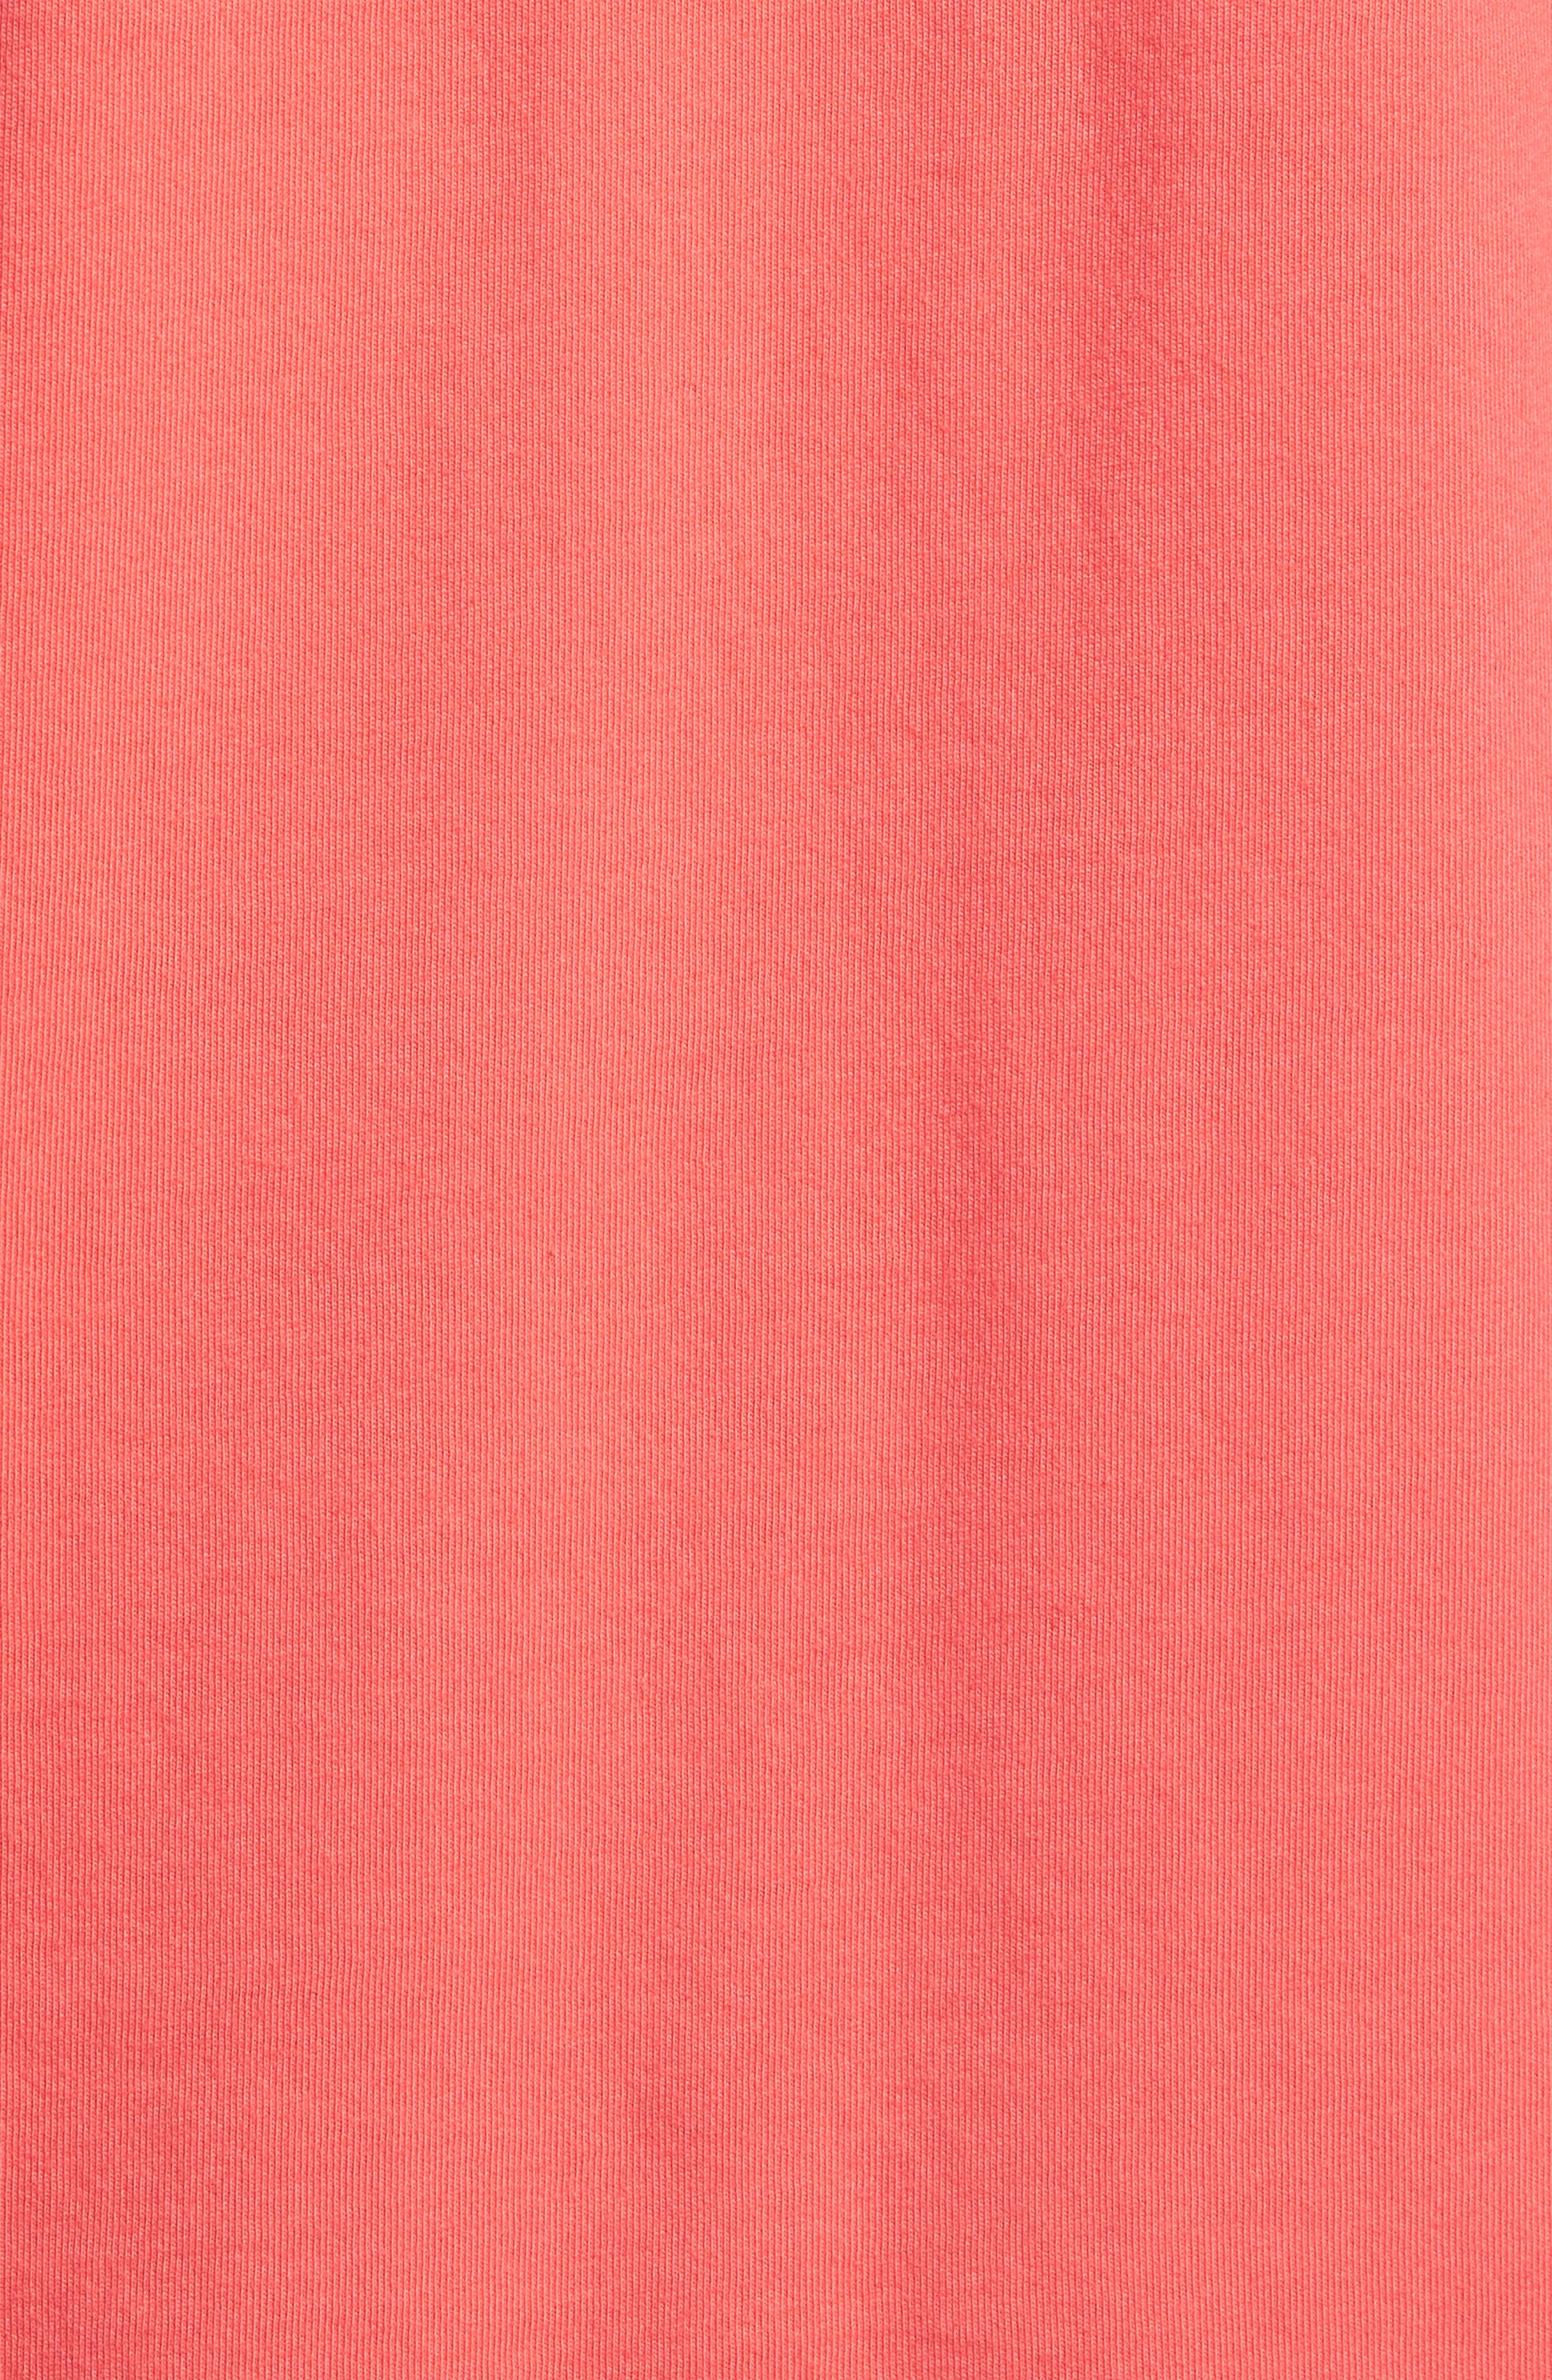 School Of Sharks Crewneck Cotton T-Shirt,                             Alternate thumbnail 5, color,                             682